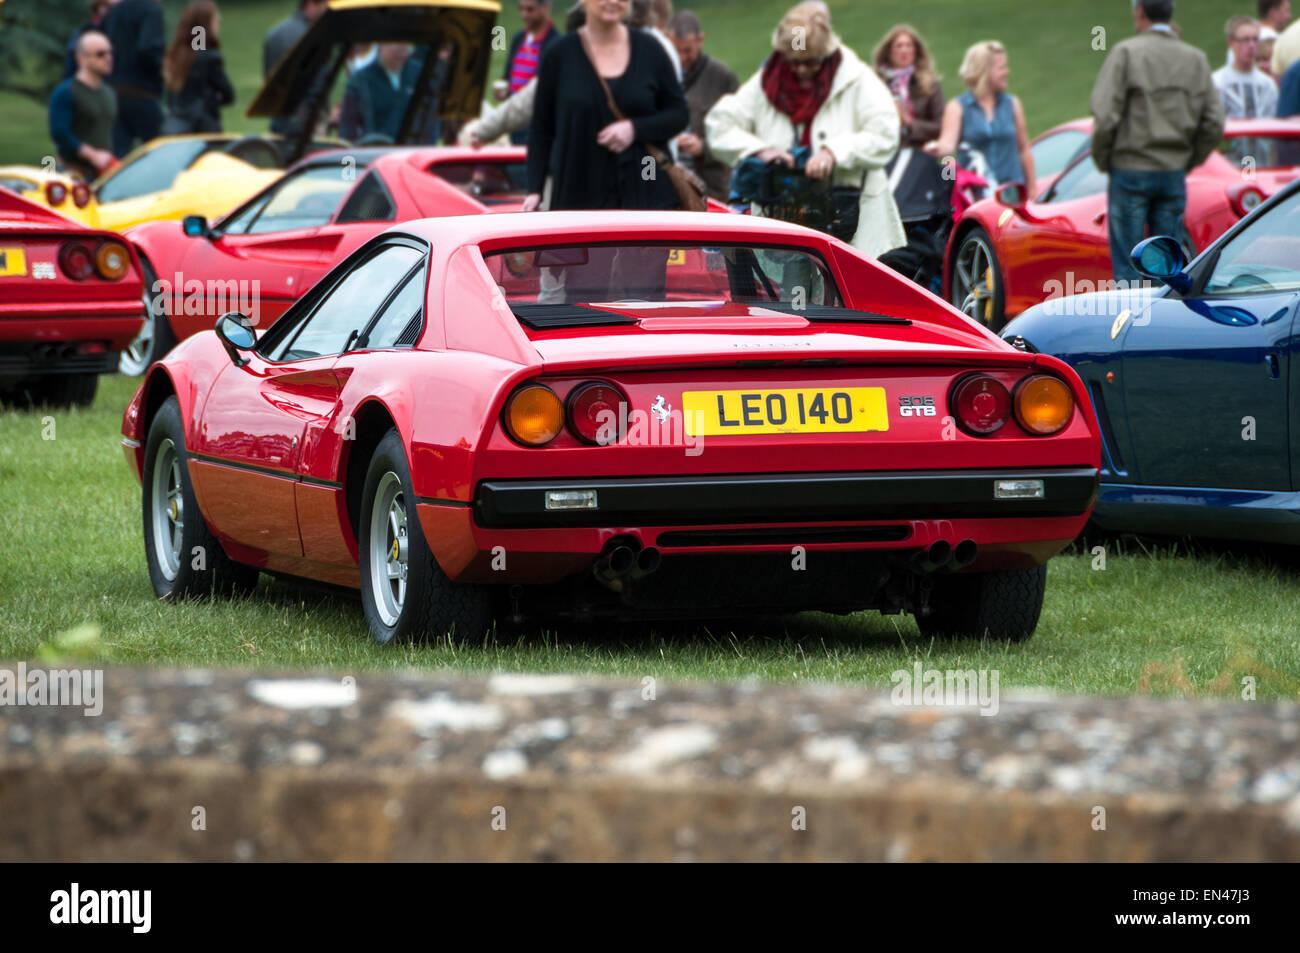 Ferrari 308 GTB at the Ferrari Owners Club Rally at Blenheim Palace, Woodstock, Oxfordshire - Stock Image